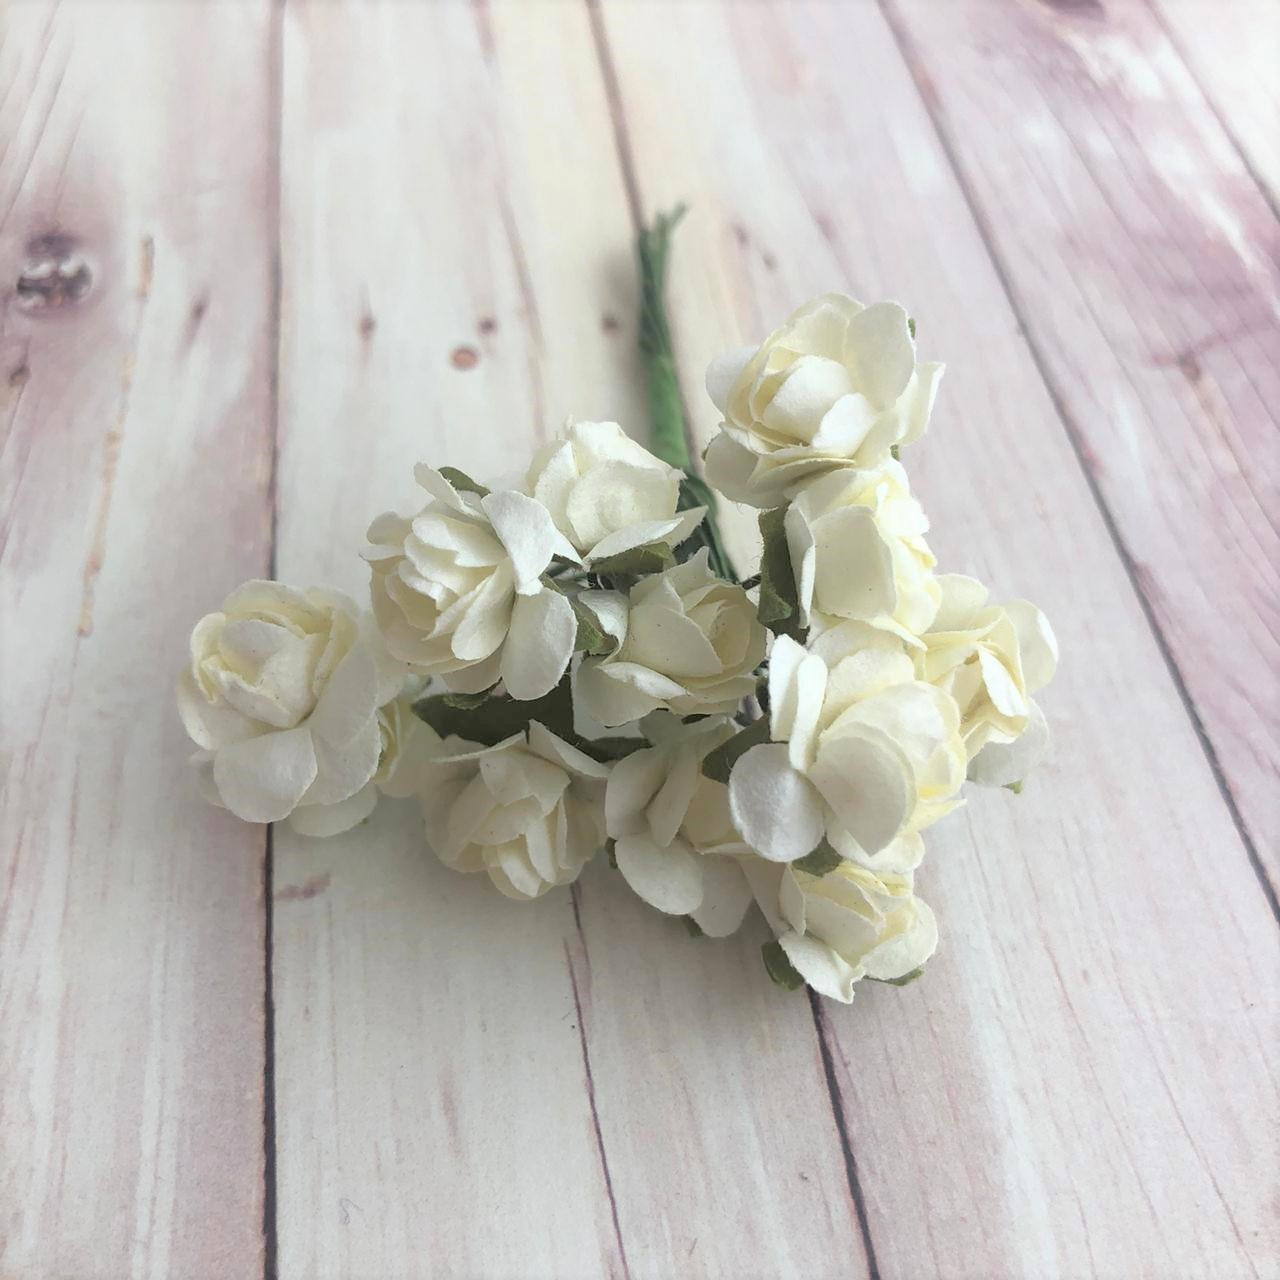 Mói de flor - Bege (MF-11)